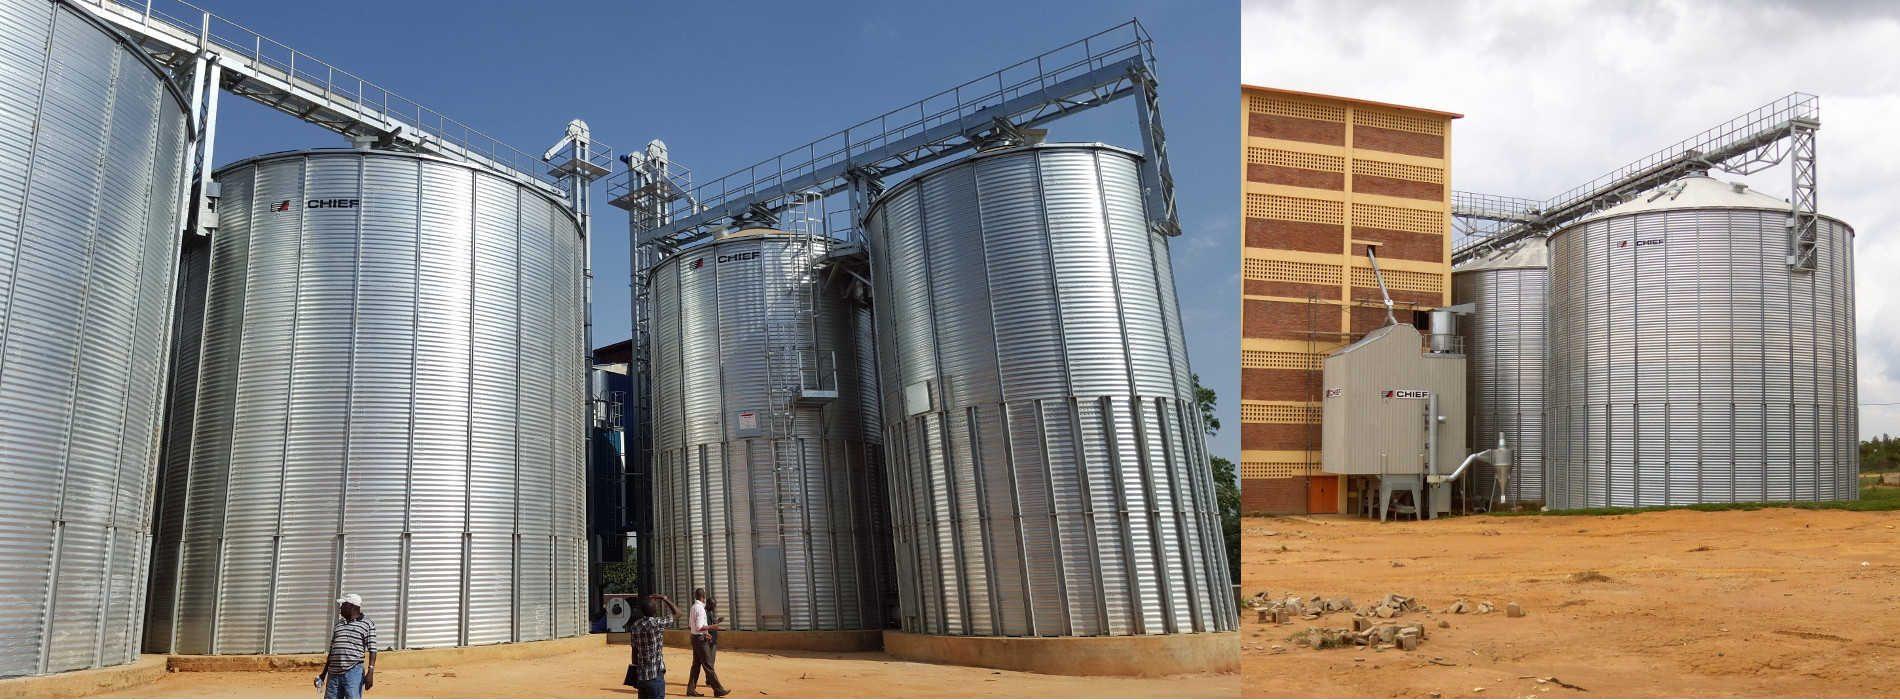 Strategic Grain Storage